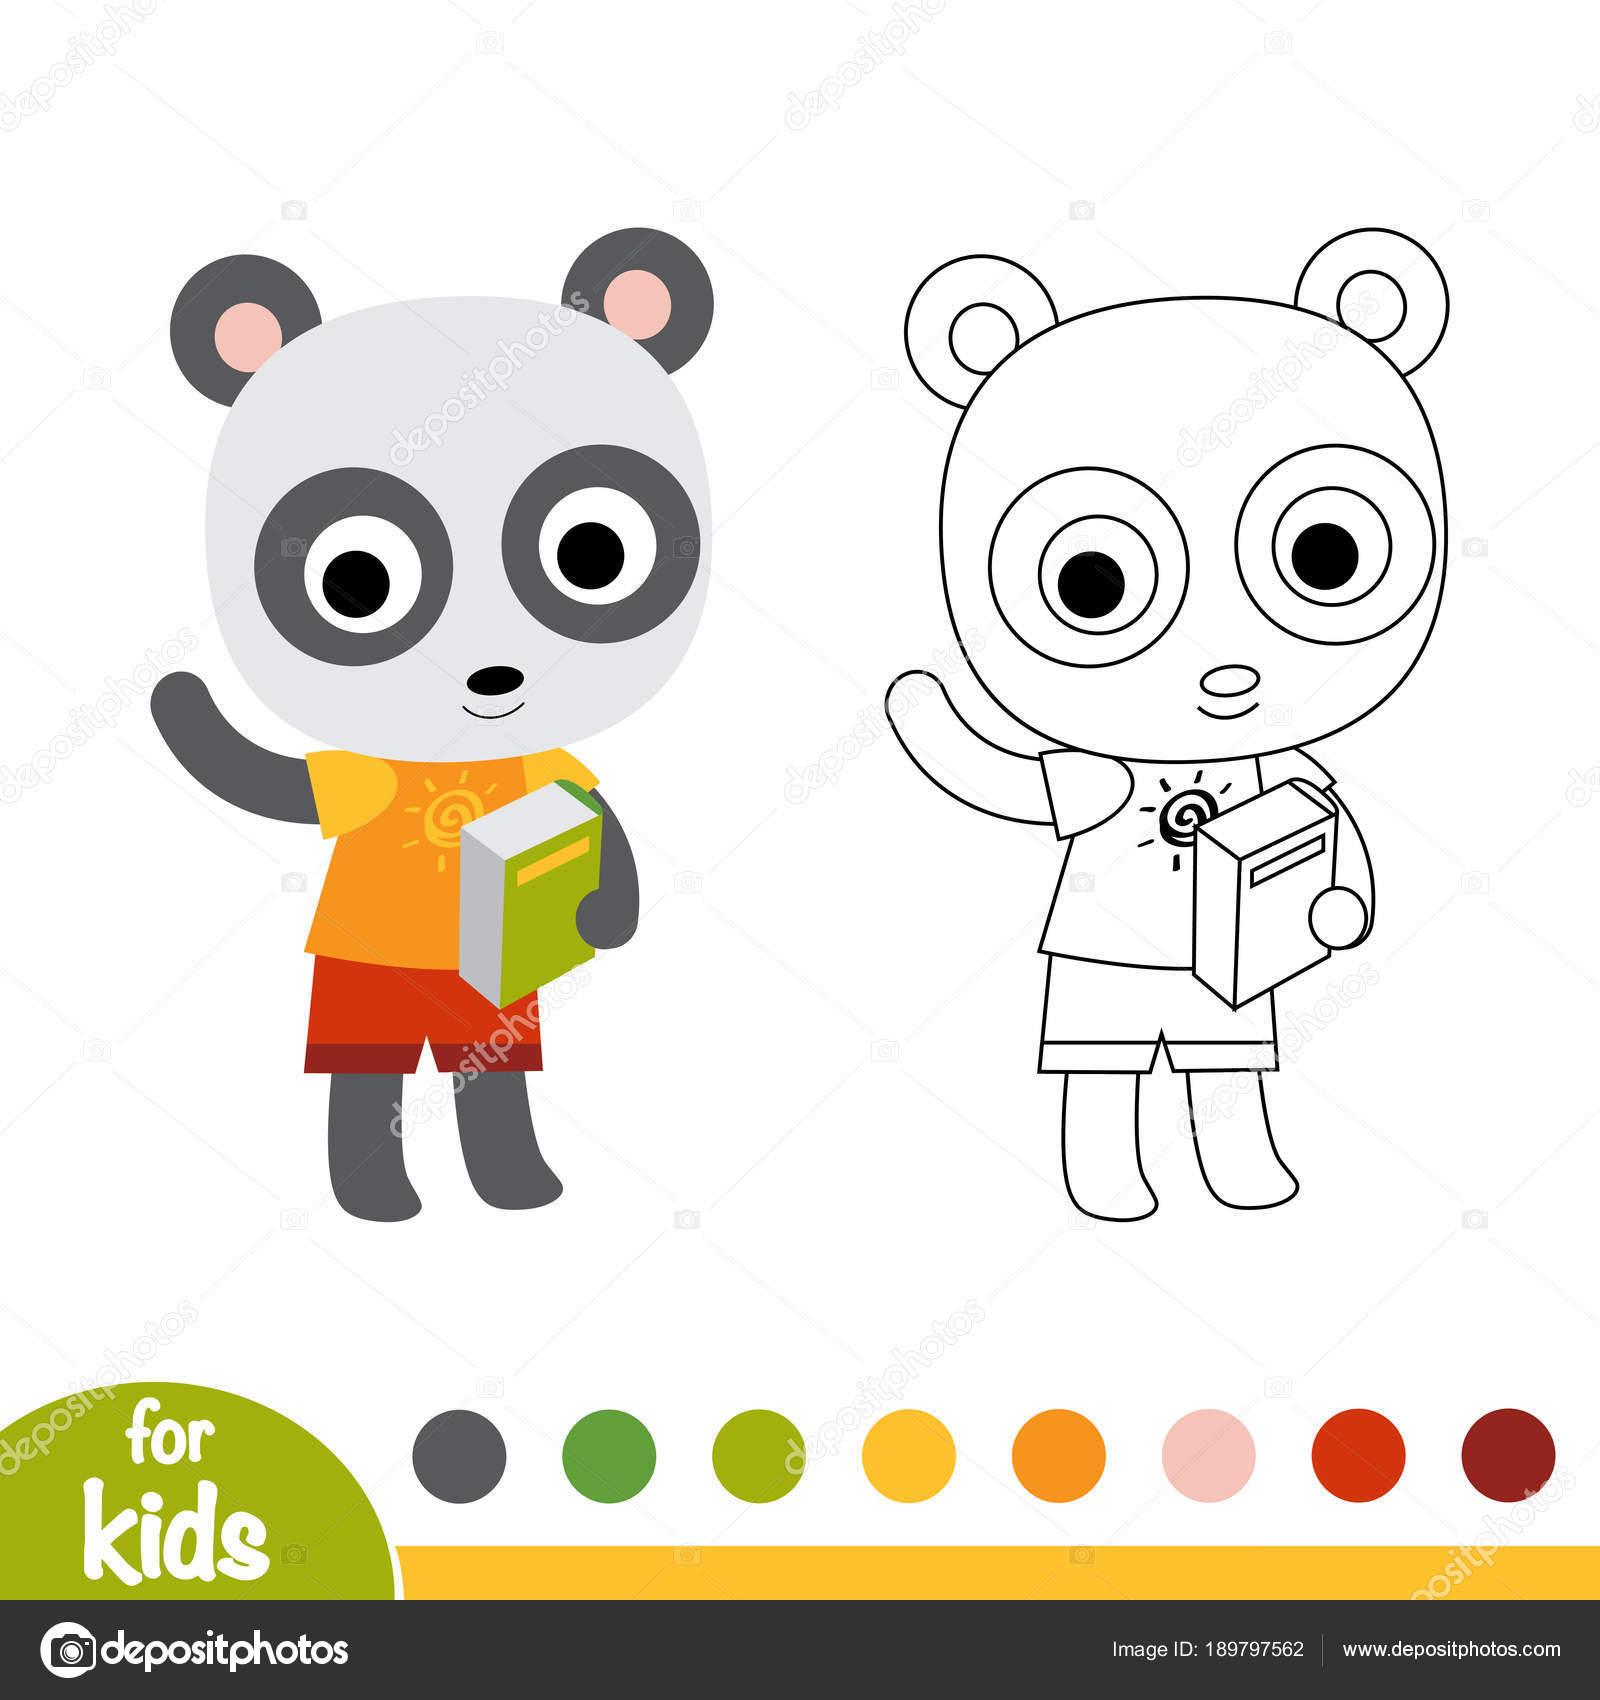 En Iyi Okul Oncesi Panda Boyama Hedef Ust Ev Boyama Sayfasi